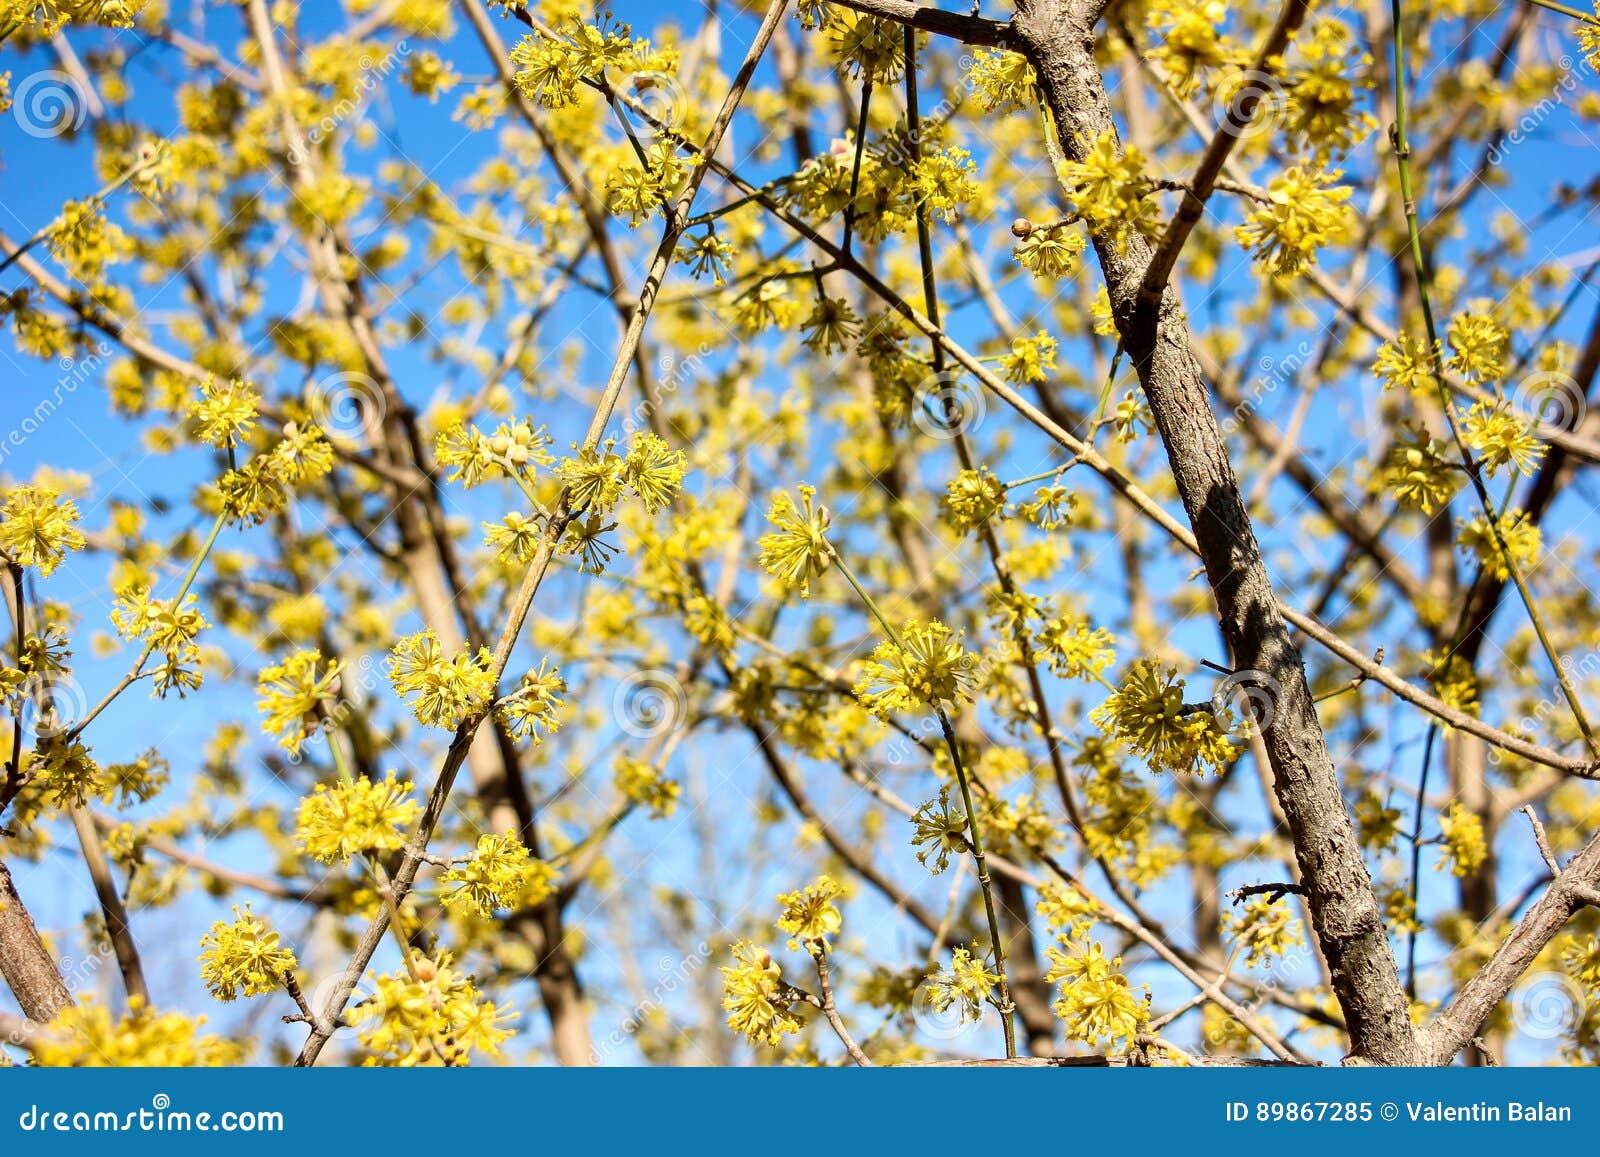 Pianta Fiori Gialli Primavera.Yellow Flowers In Spring Stock Image Image Of Beautiful 89867285